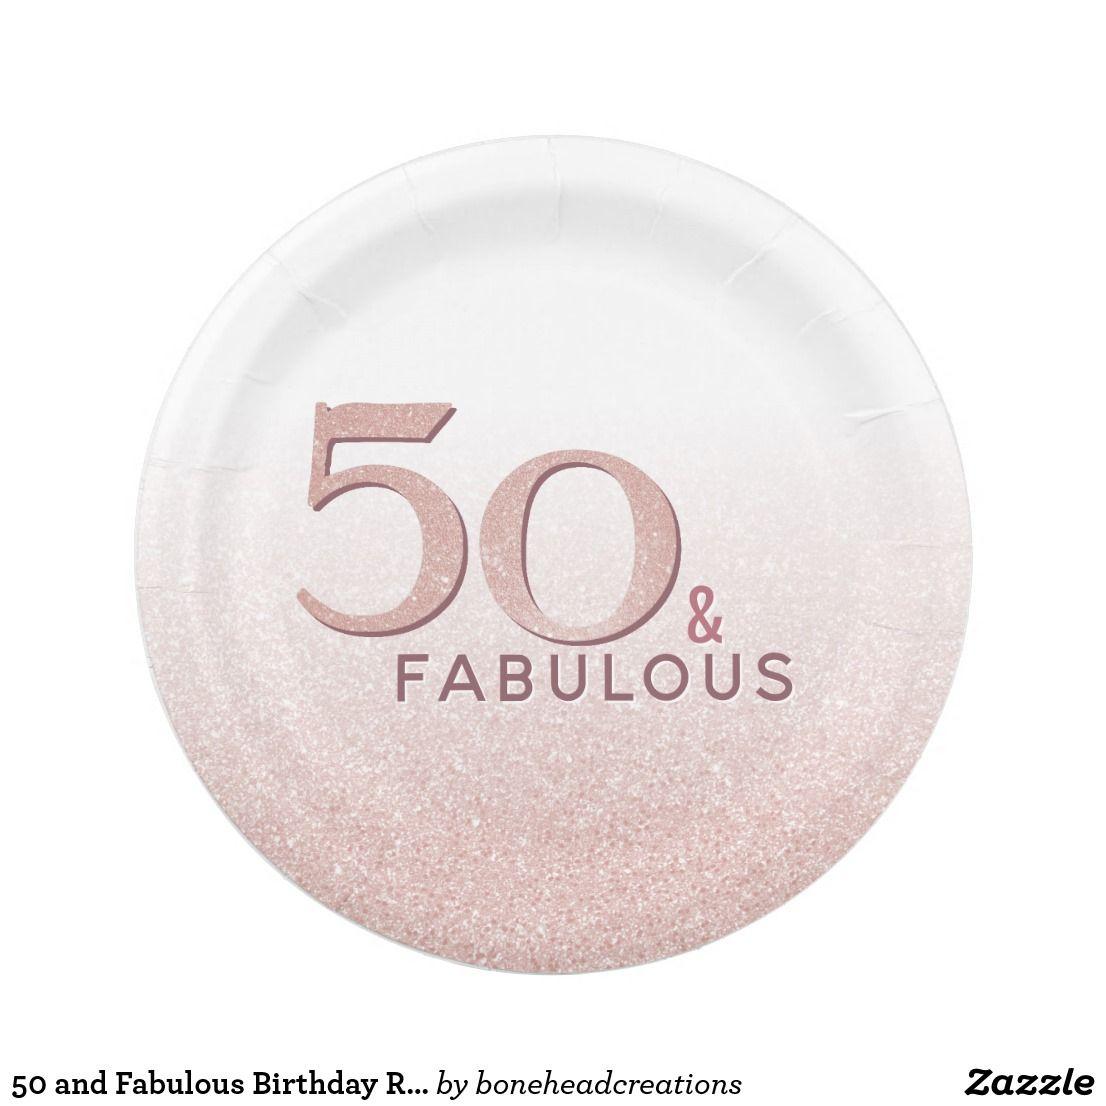 50 and Fabulous Birthday Rose Gold Glitter Paper Plate #goldglitterbackground